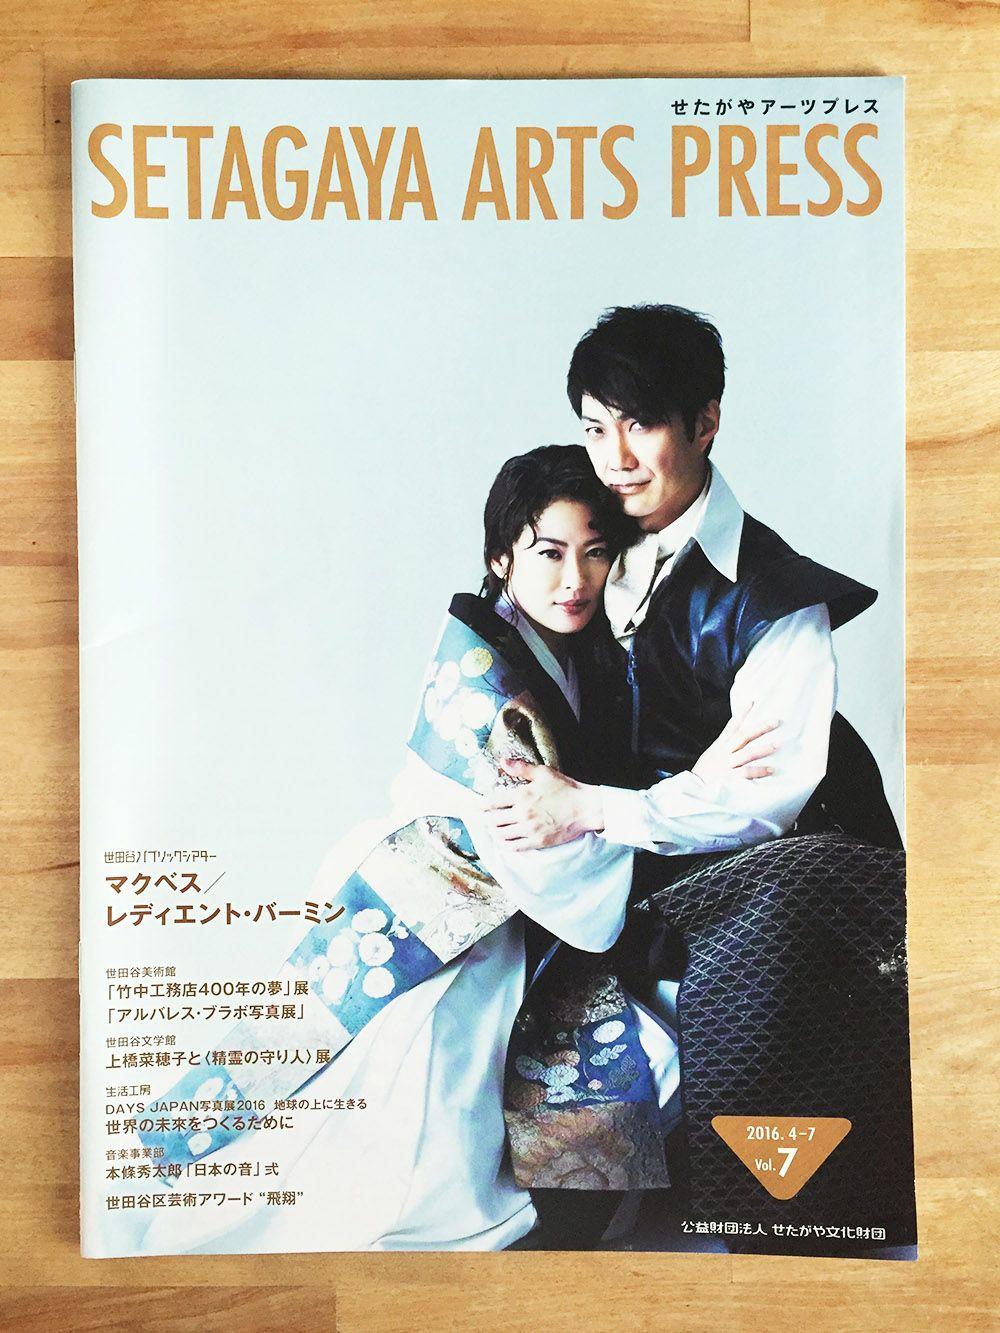 SETAGAYA ARTS PRESS